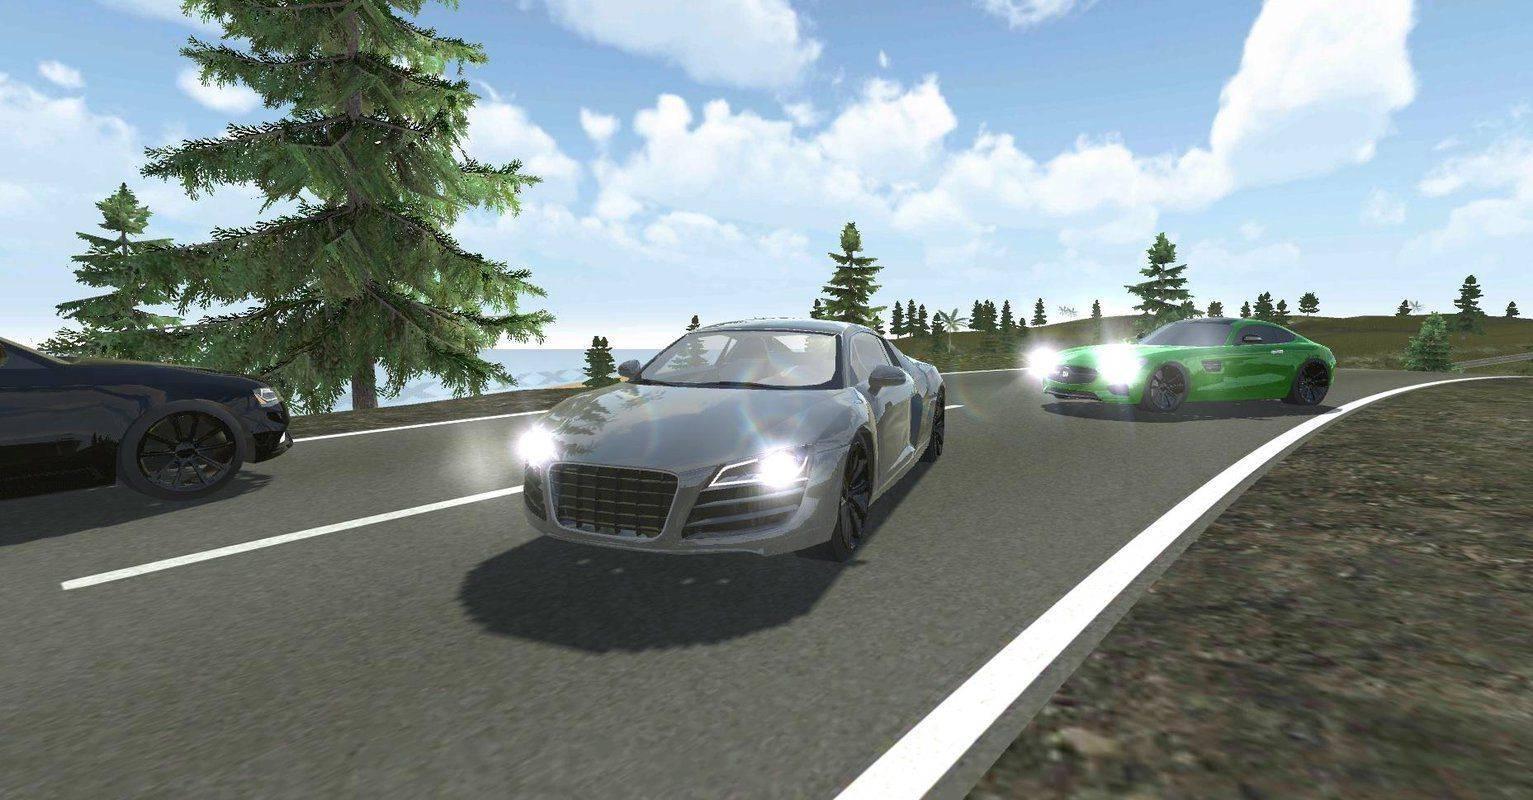 European luxuryCars安卓版游戏截图